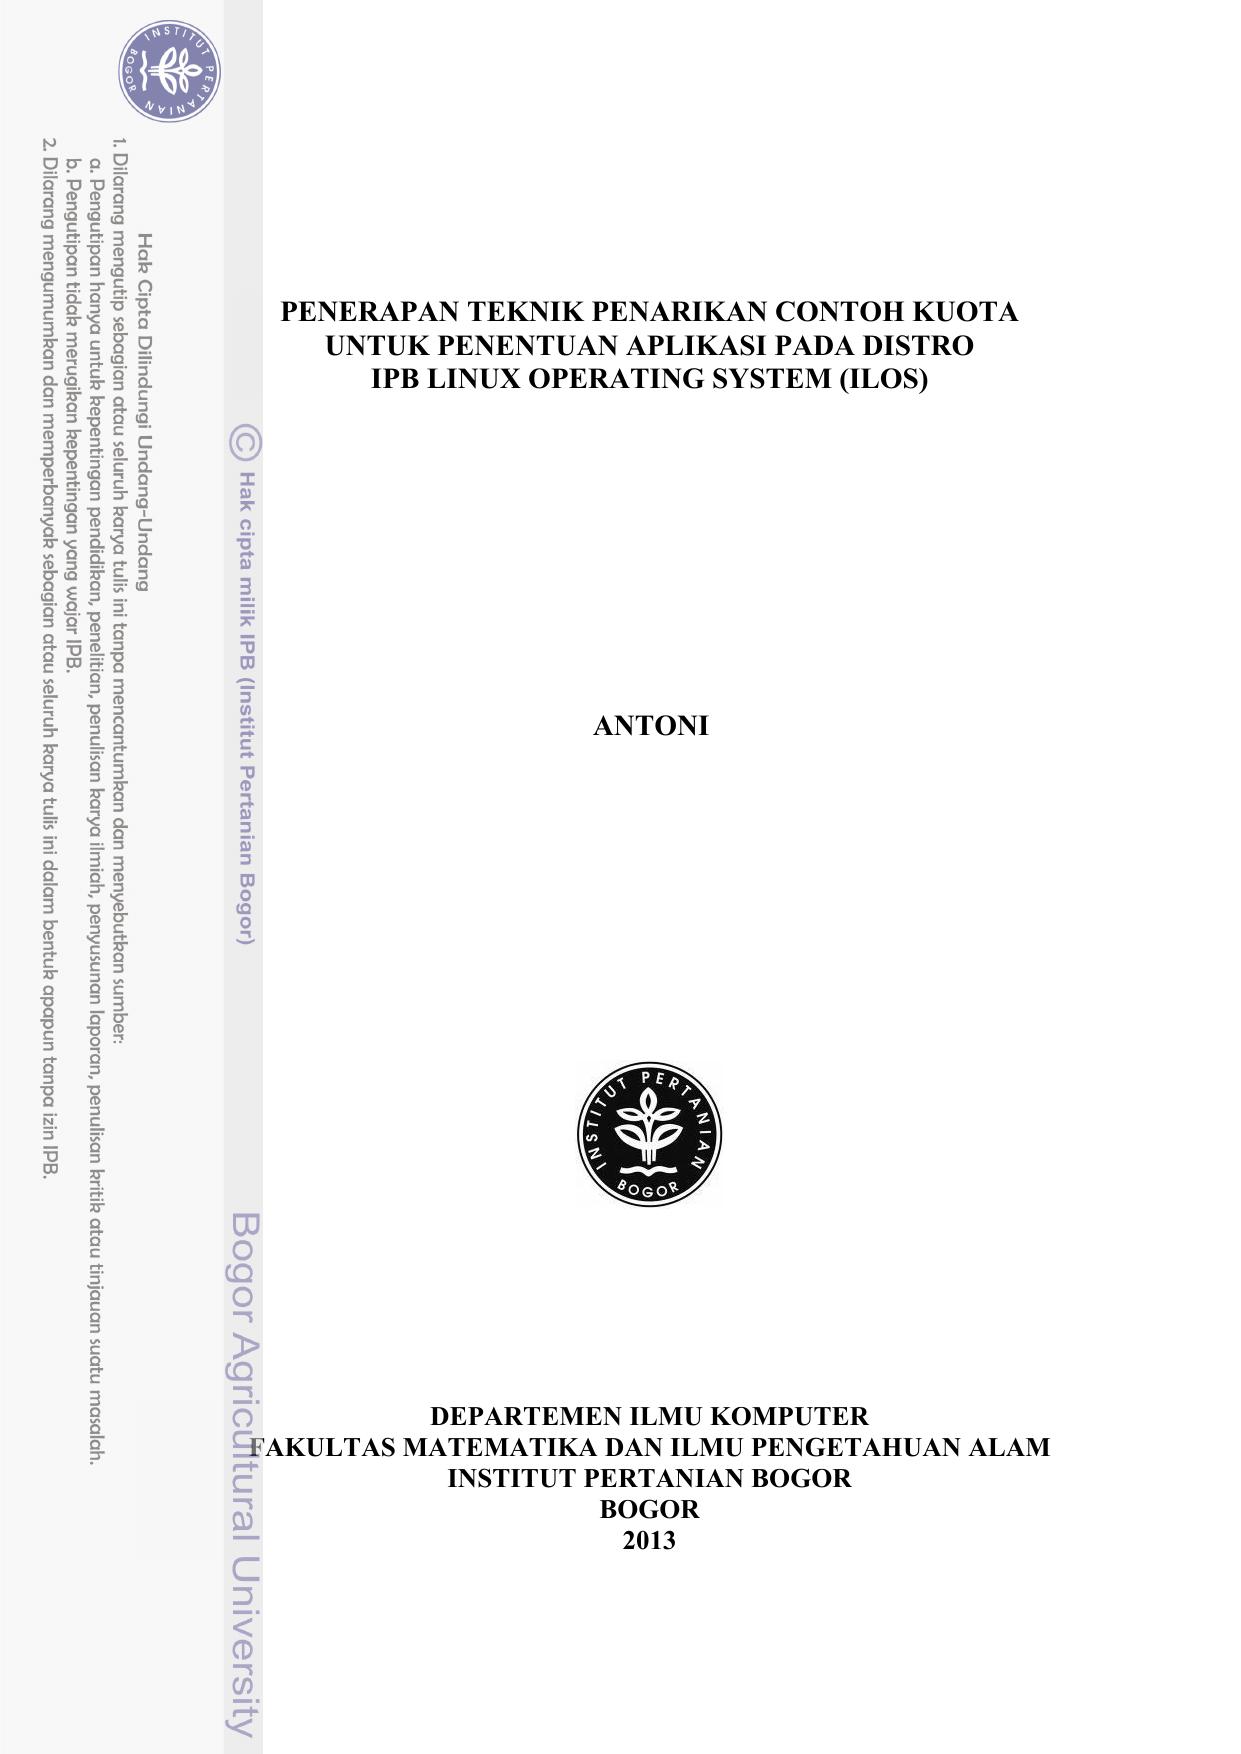 Templat tugas akhir S1 - IPB Repository